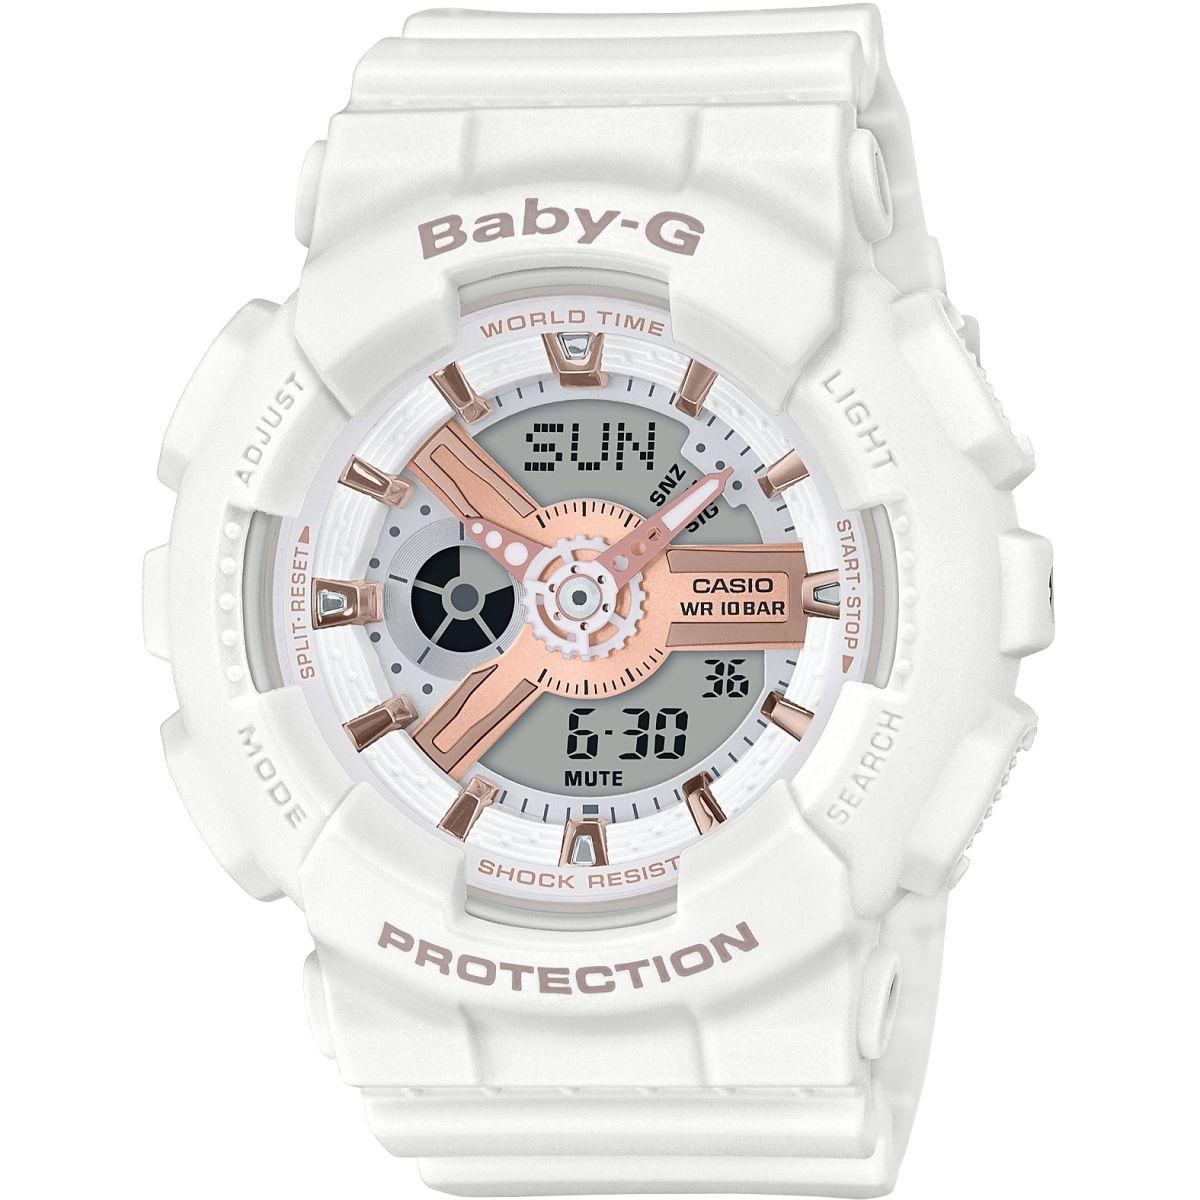 Zegarek Casio Baby-G BA-110RG-7AER